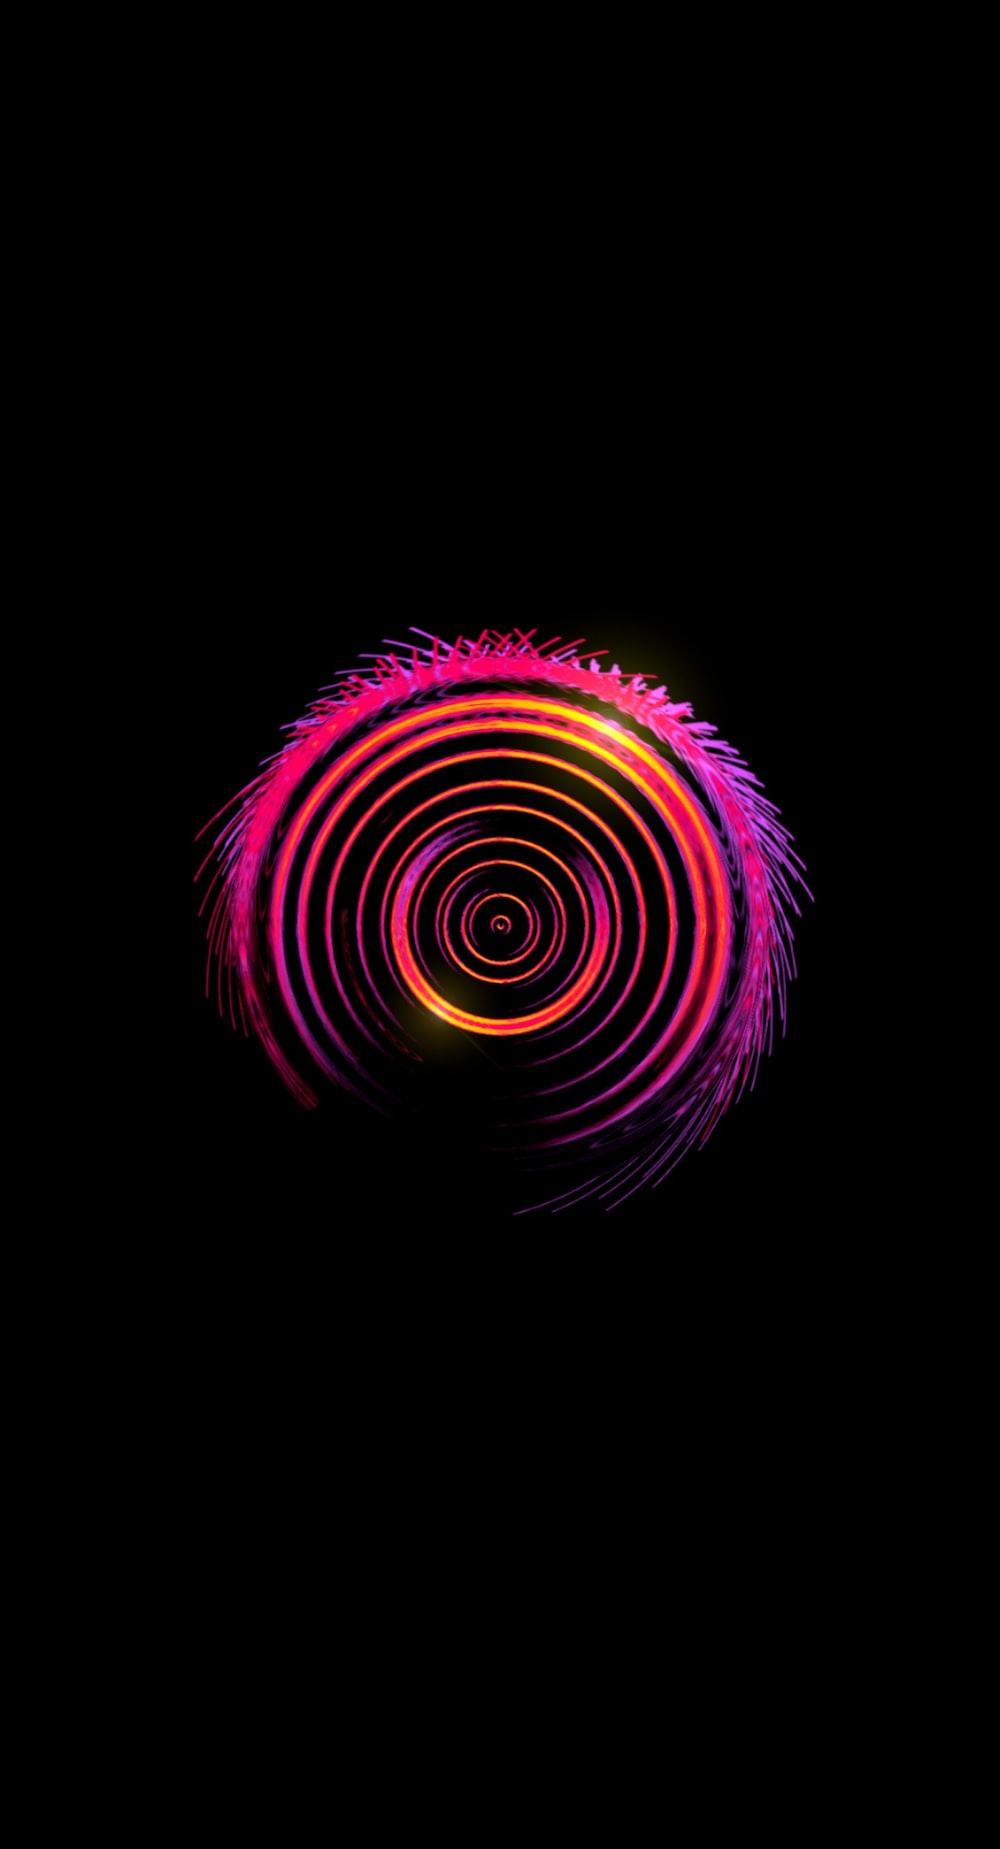 purple and white round illustration